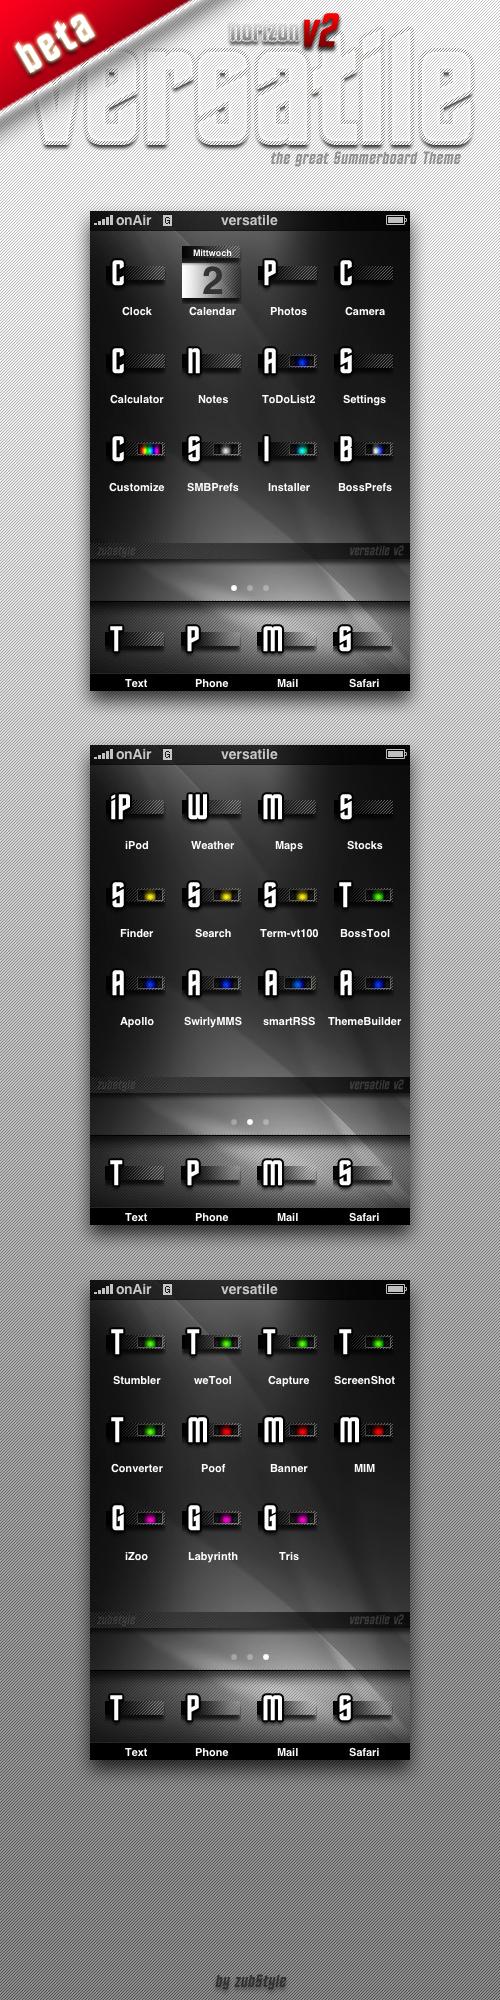 beta: -theme- versatile v2 by zubstyle